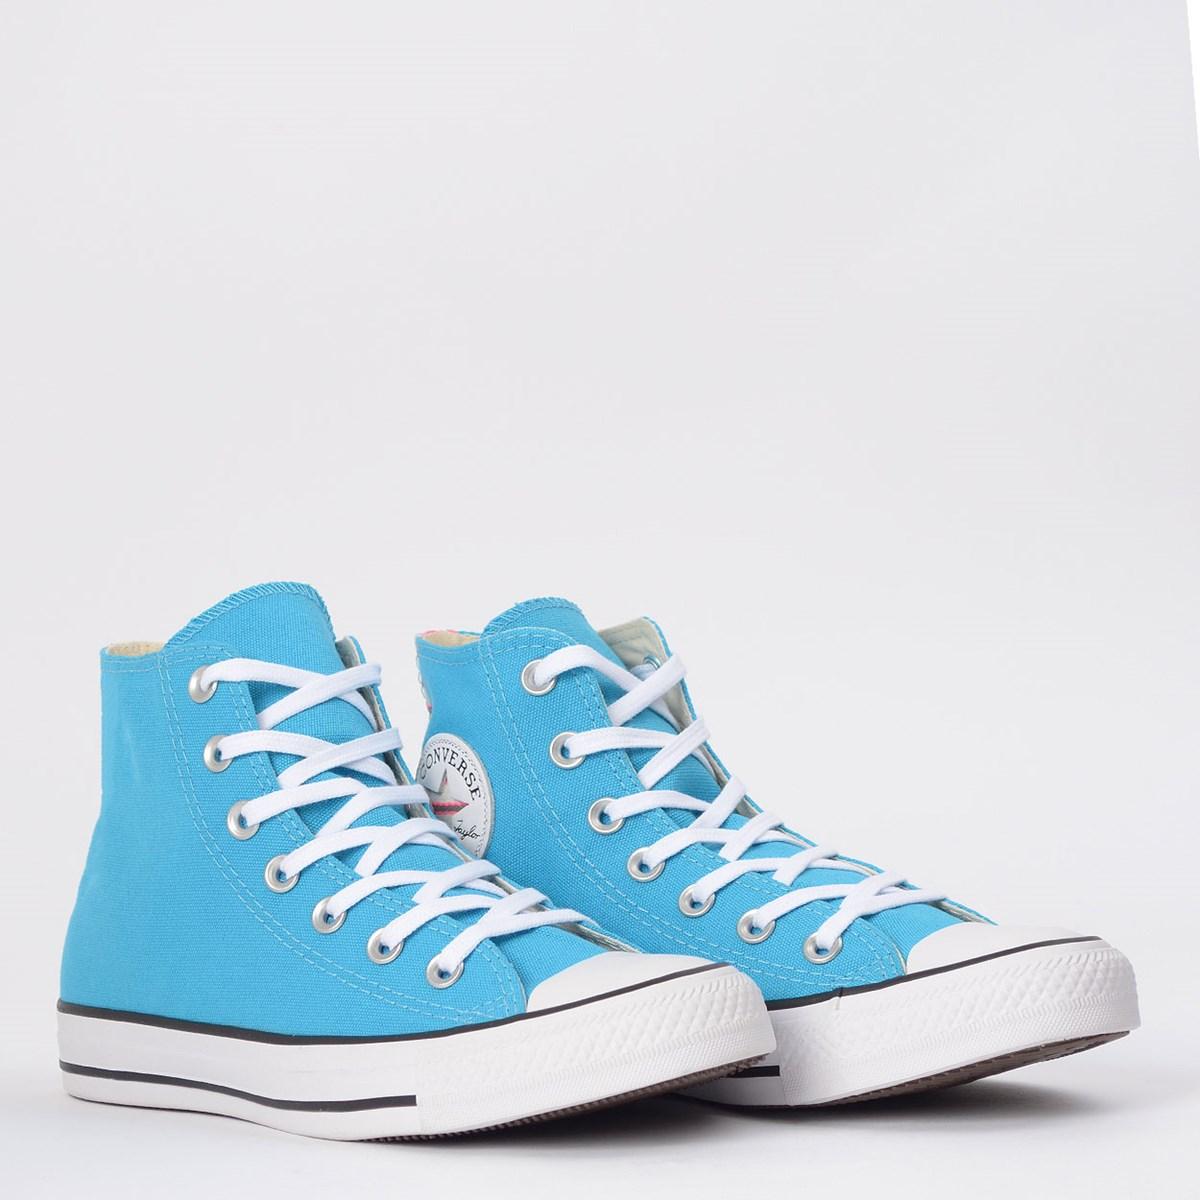 Tênis Converse Chuck Taylor All Star Hi Azul Náutico CT14860001